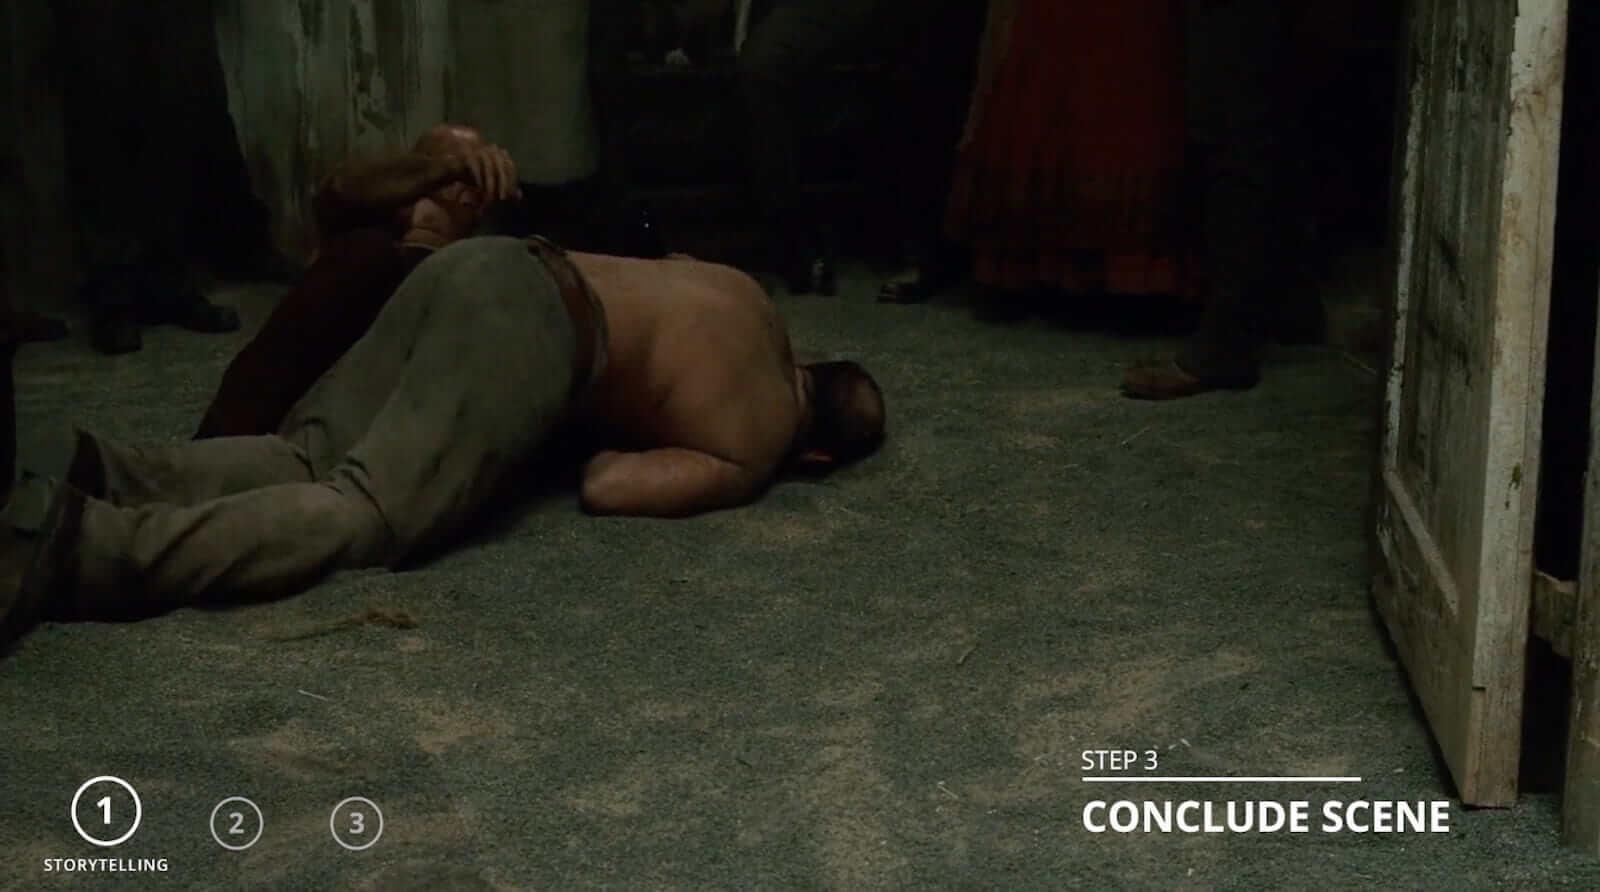 Sherlock Holmes fight scene - Conclude scene